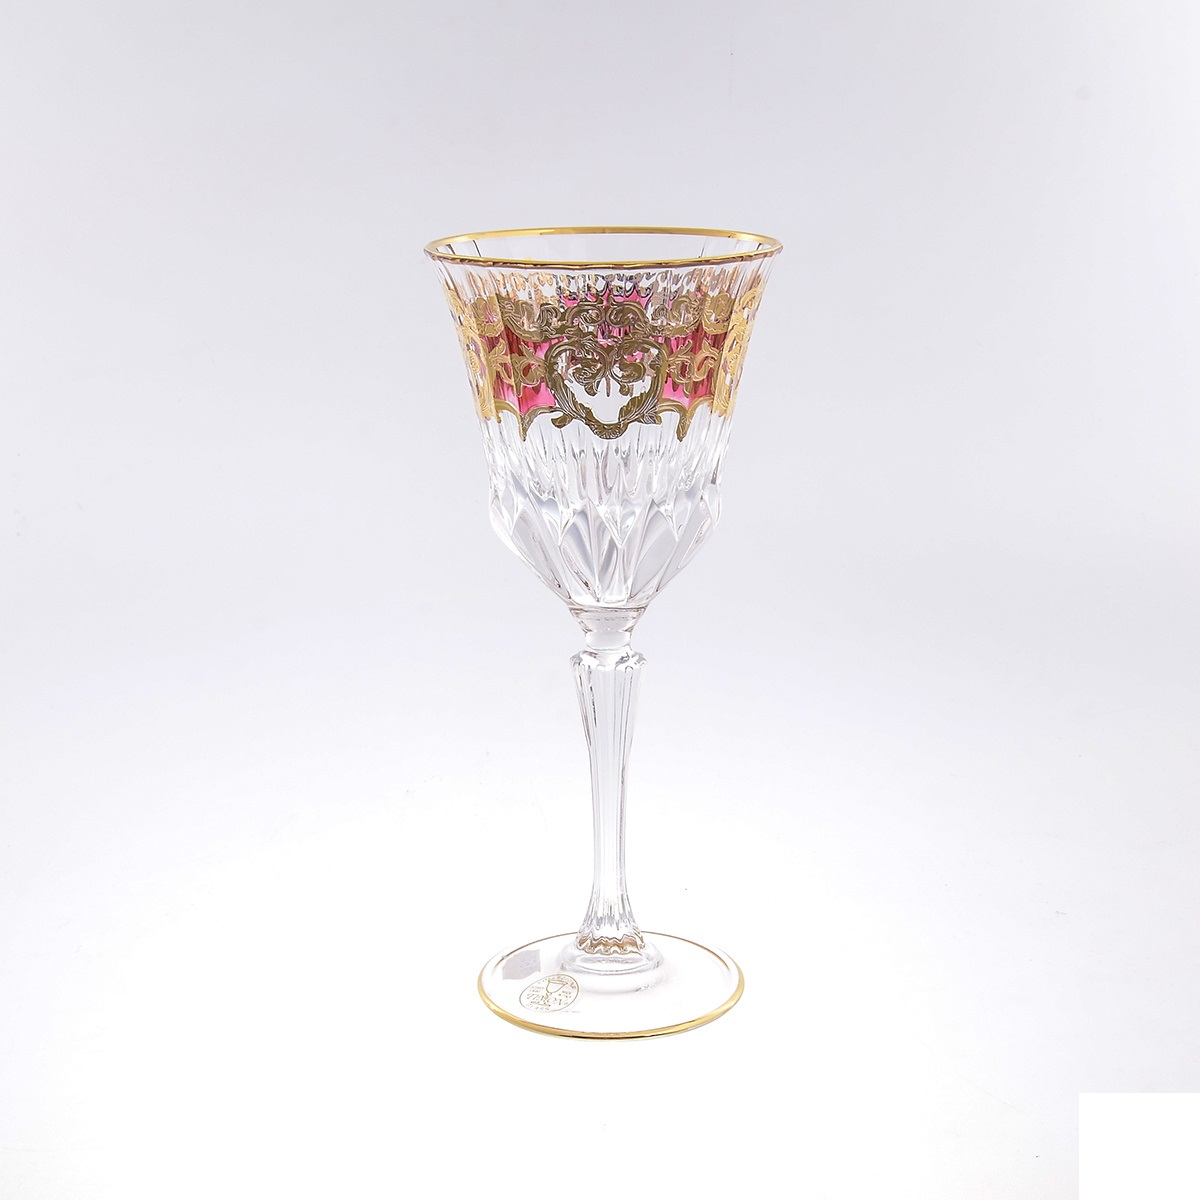 Набор хрустальных бокалов для вина TIMON, 6 шт.